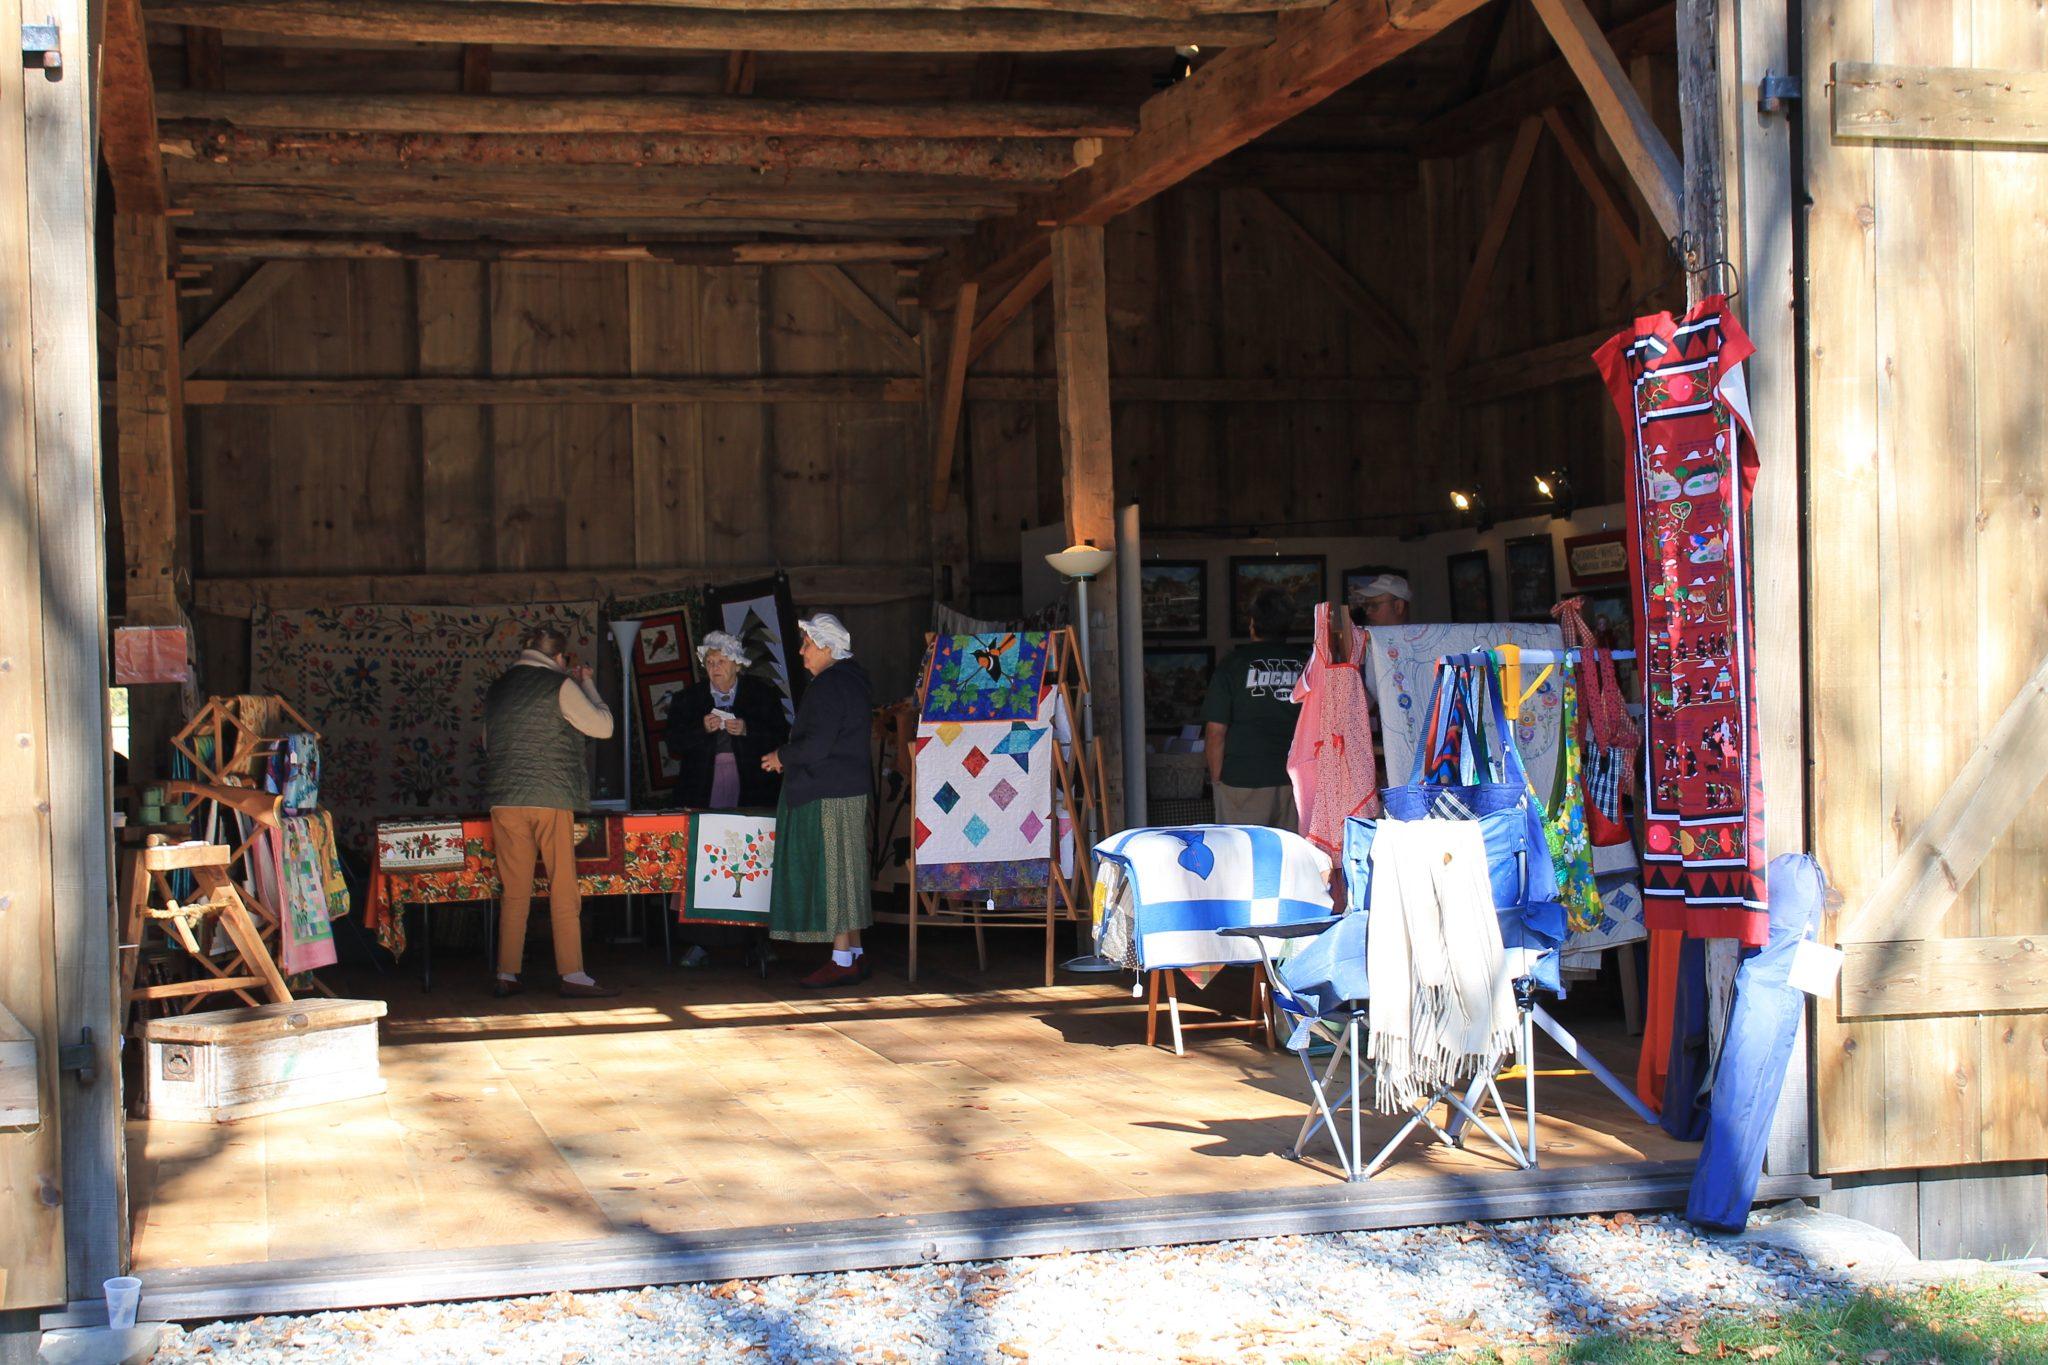 Vendors in the Barn